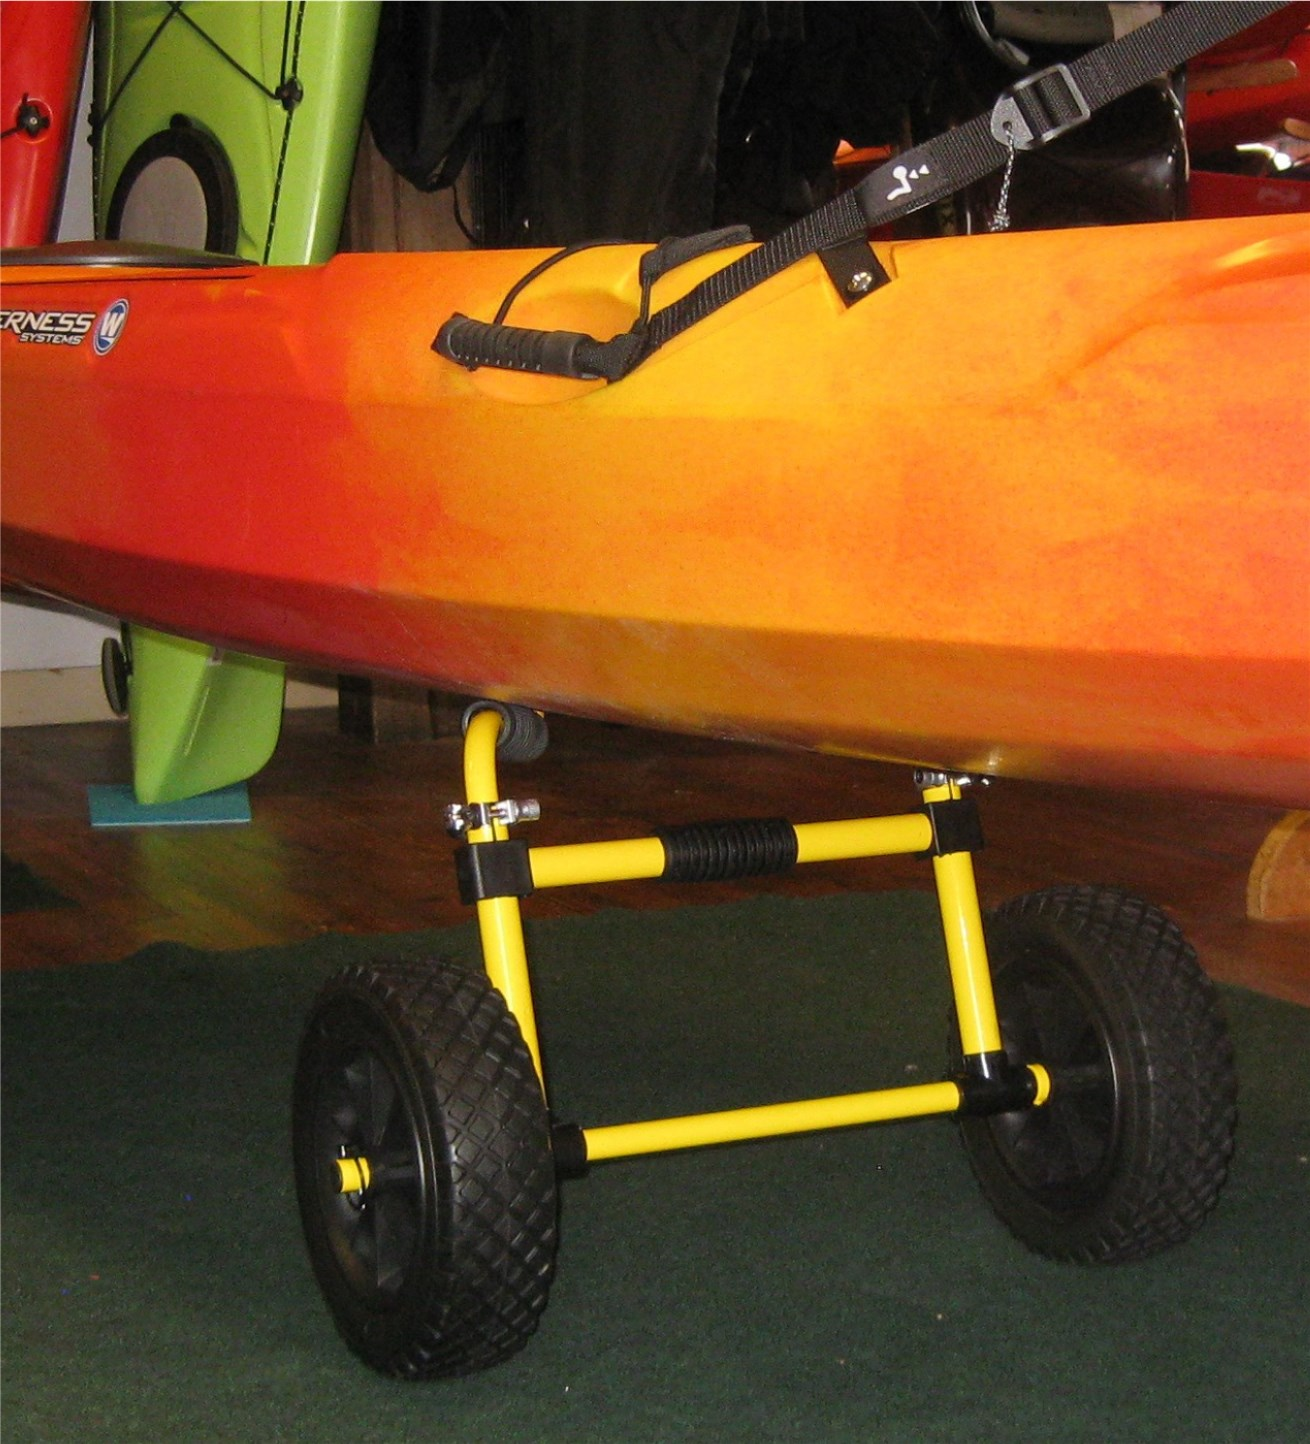 kayak-cart-through-scuppers.jpg